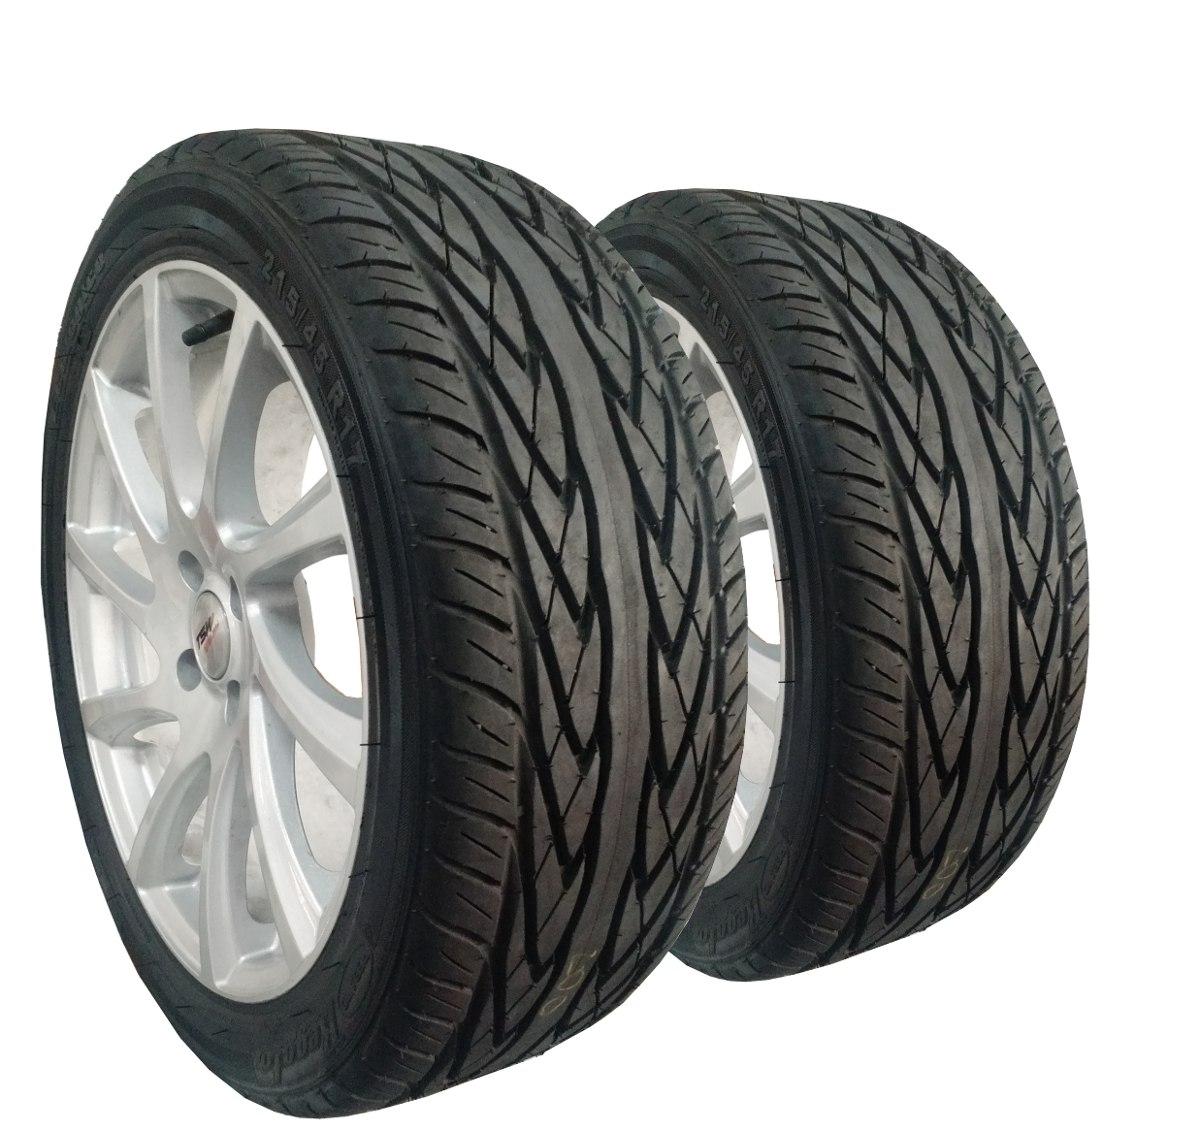 kit 2 pneus 195 50 r15 remold km200 desenho toyo proxxes 4 r 485 00 em mercado livre. Black Bedroom Furniture Sets. Home Design Ideas